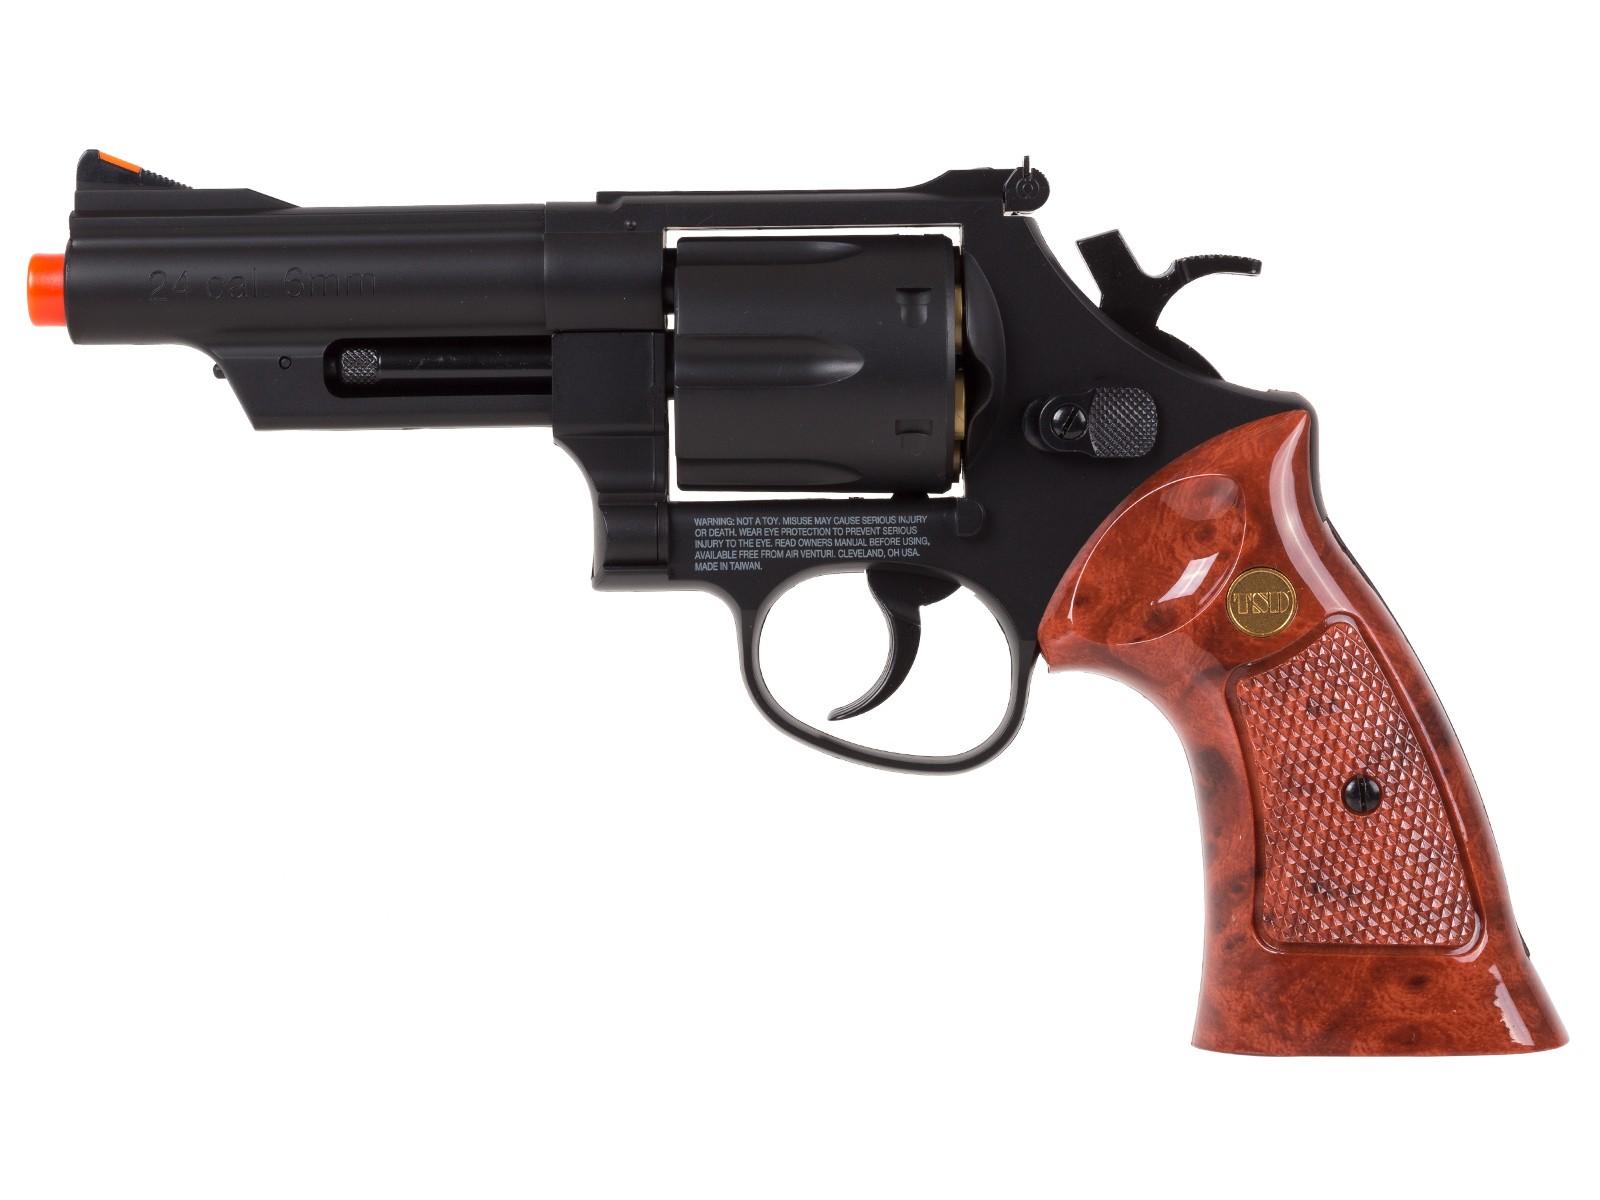 TSD_UHC_UG131B_Airsoft_Gas_Revolver_4_inch_6mm